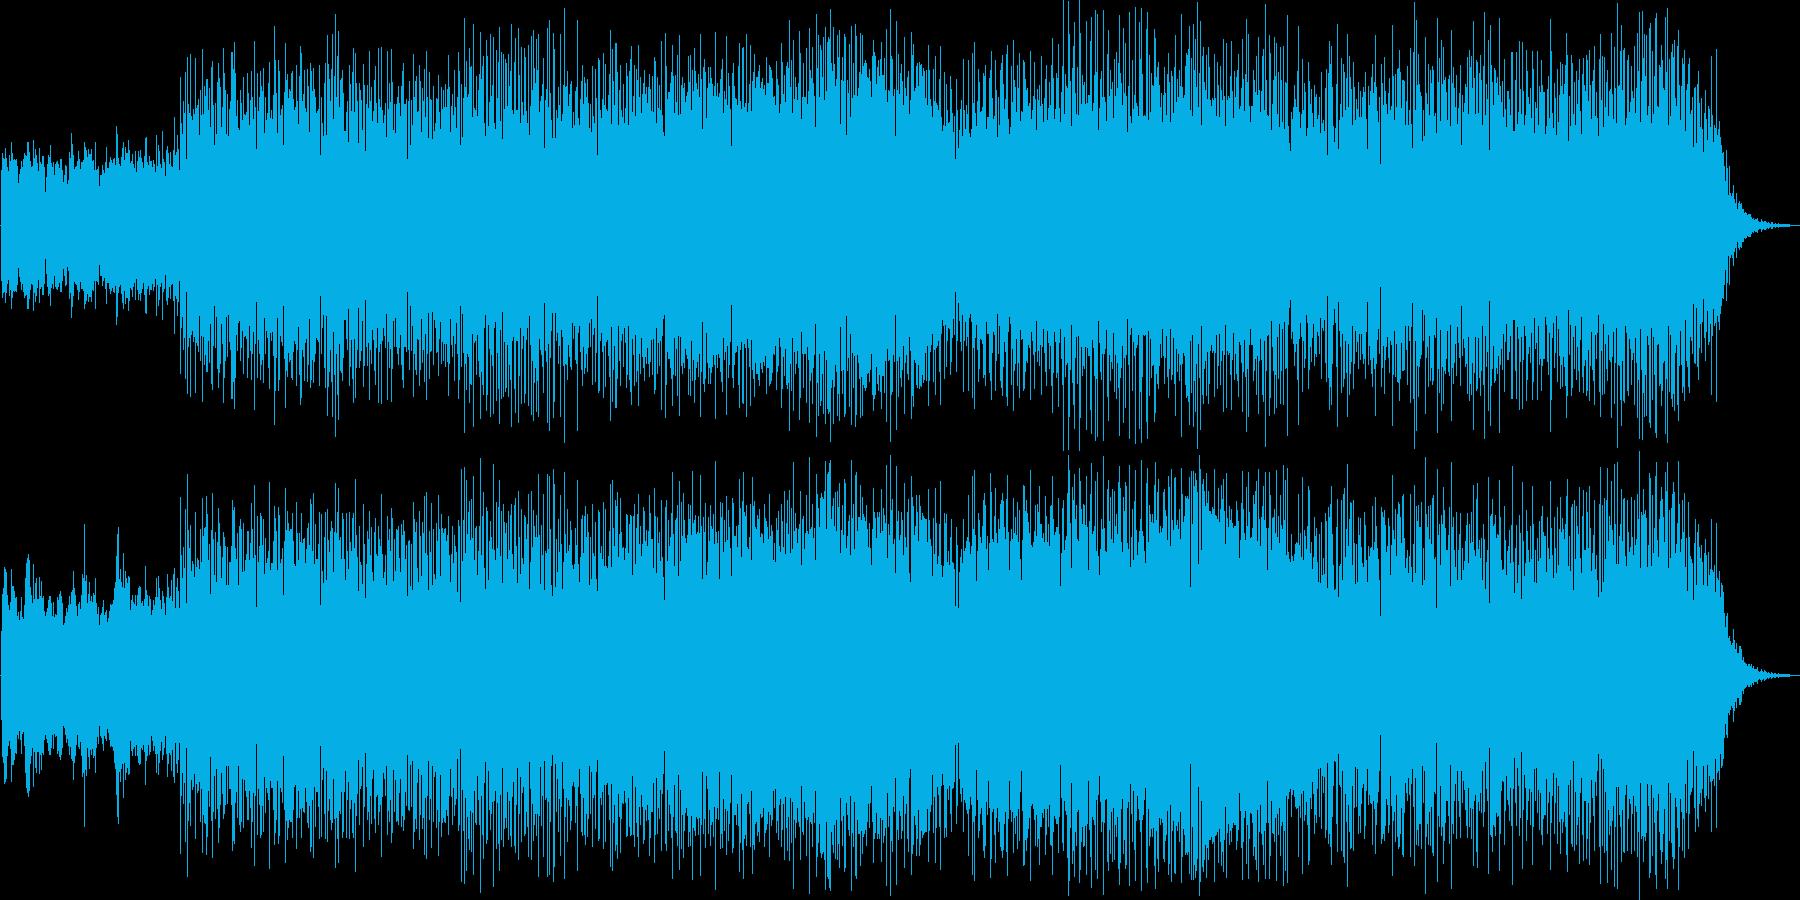 ECM,ヒーリング系Jazz,Bossaの再生済みの波形